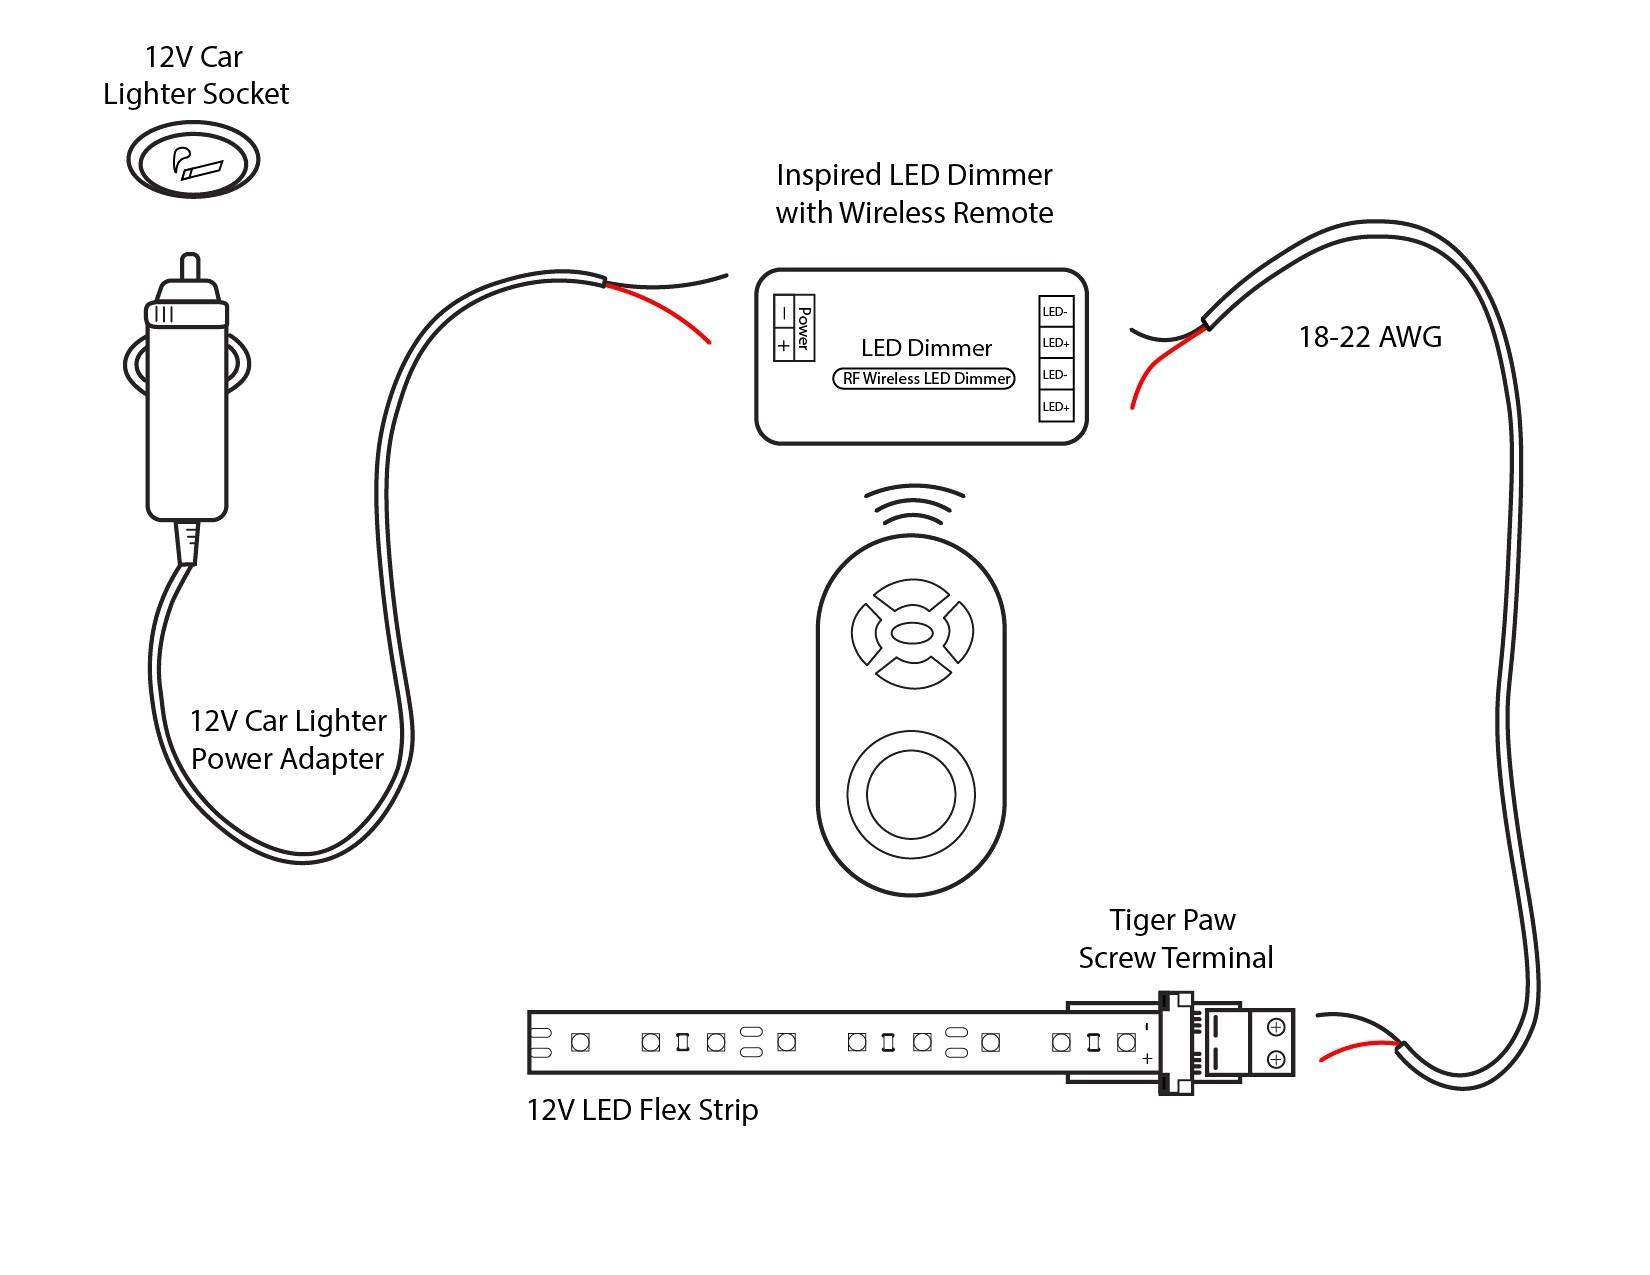 cigarette jack wiring diagram diy enthusiasts wiring diagrams u2022 rh okdrywall co  car cigarette lighter adapter wiring diagram